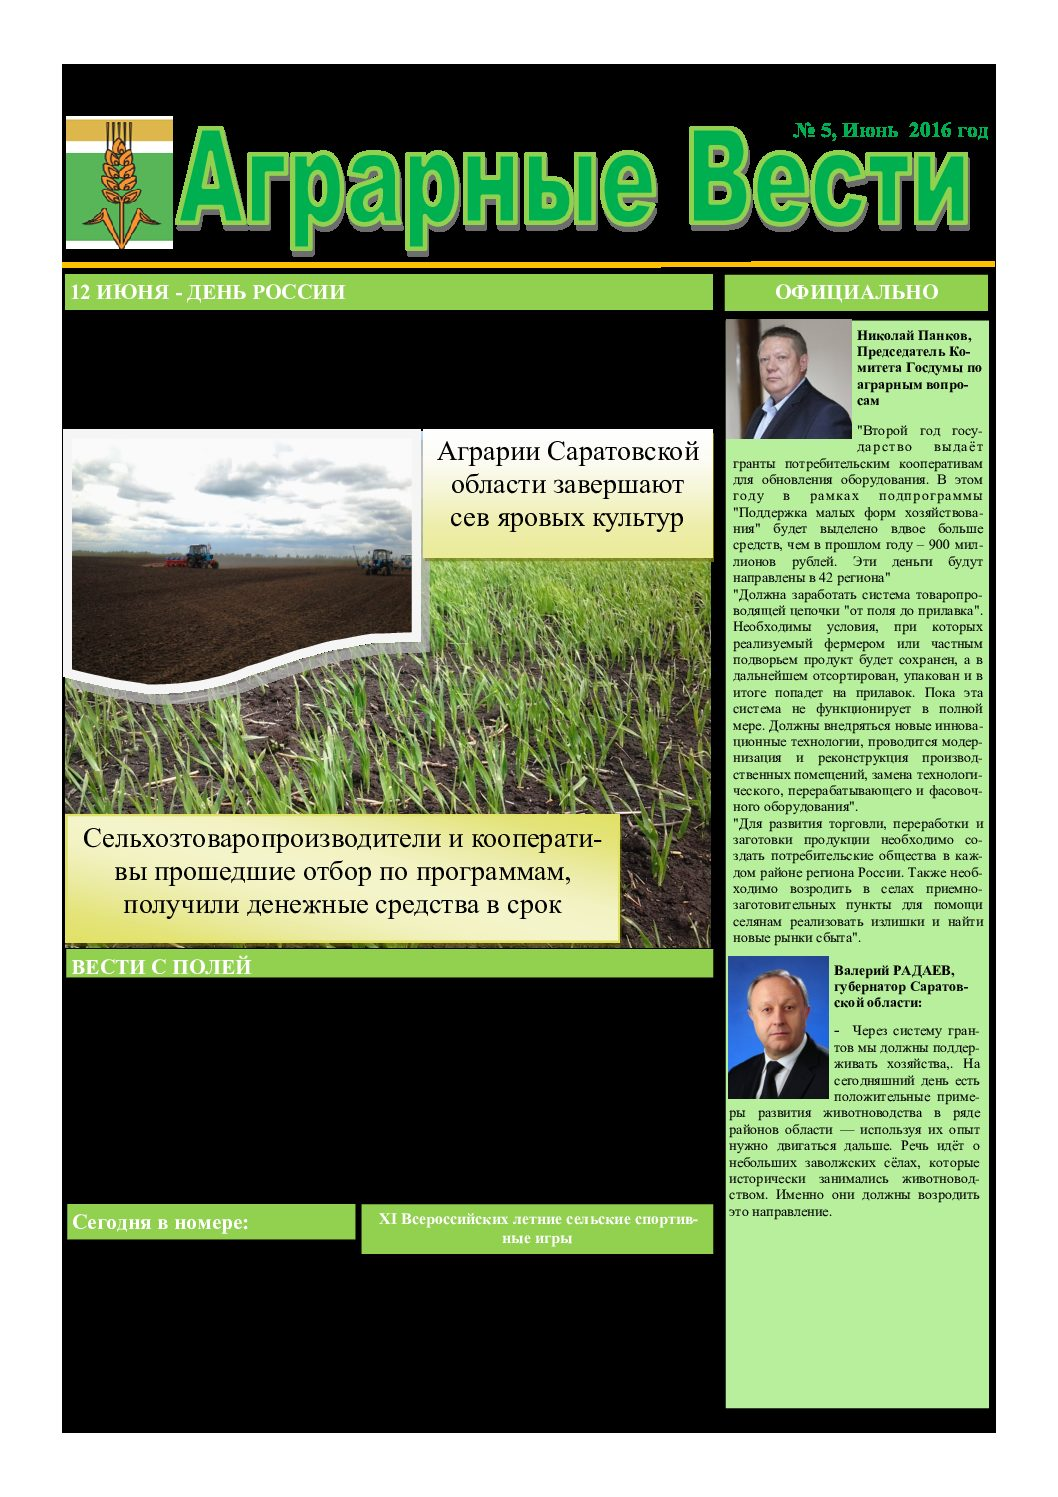 https://saratovagro.ru/wp-content/uploads/2020/08/июнь-pdf.jpg